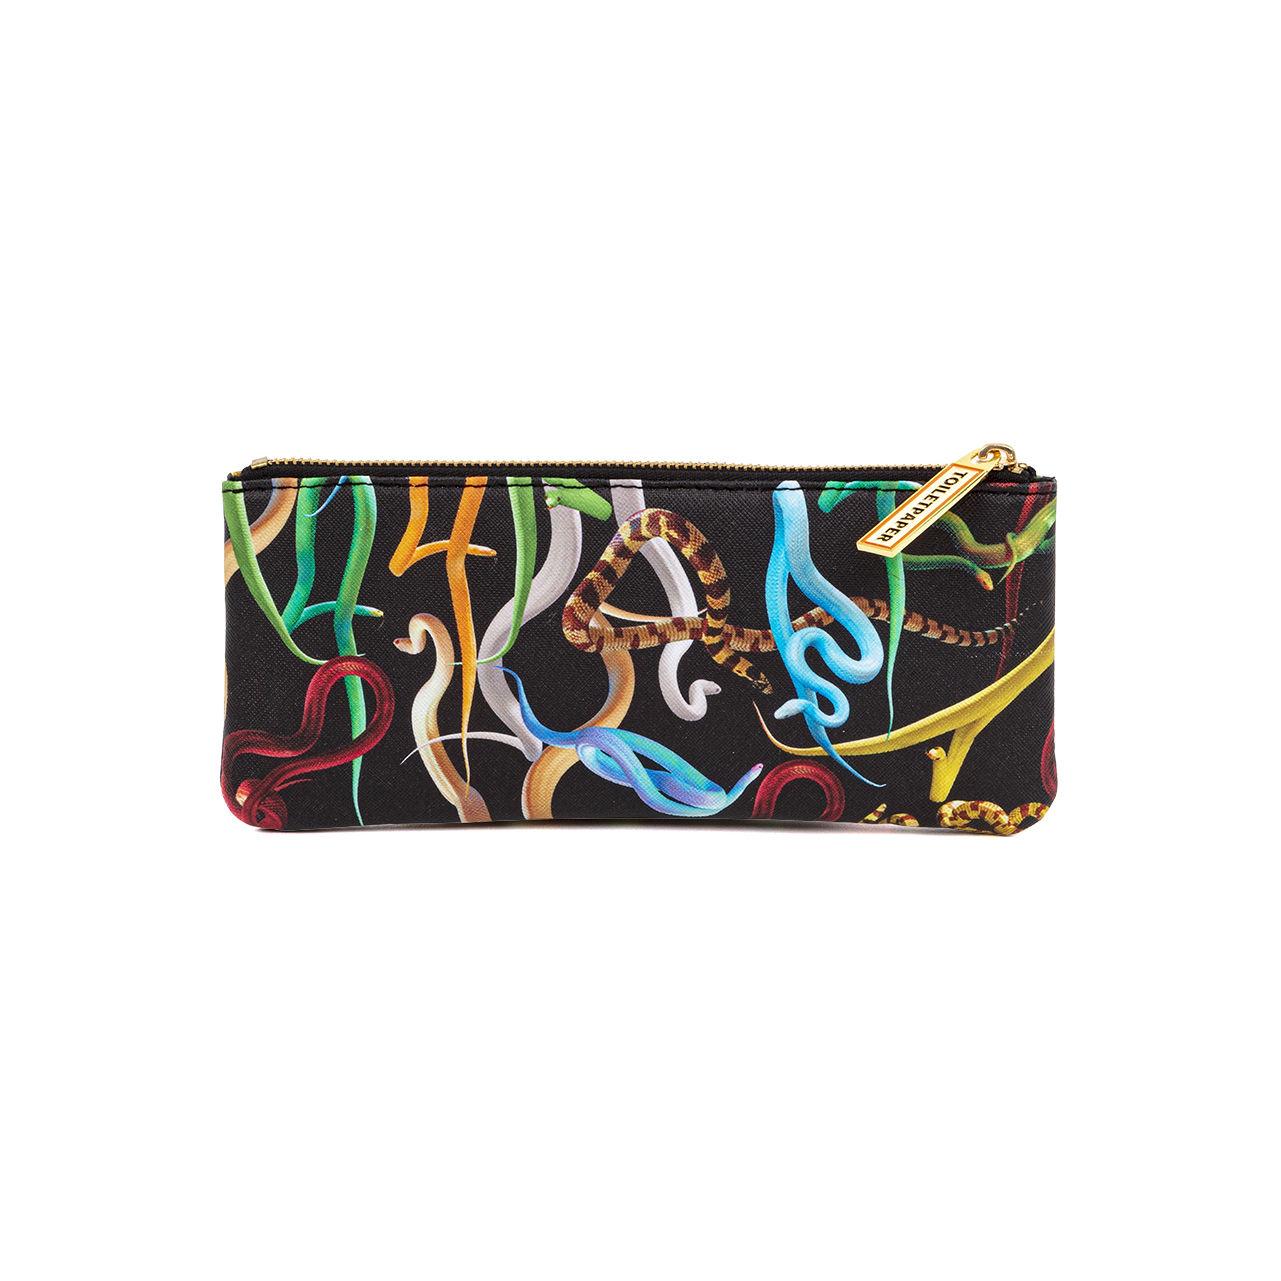 Accessori moda - Borse, Valigie e Portafogli - Trousse Toiletpaper - / Snakes - Tessuto di Seletti - Snakes - Poliestere, Poliuretano